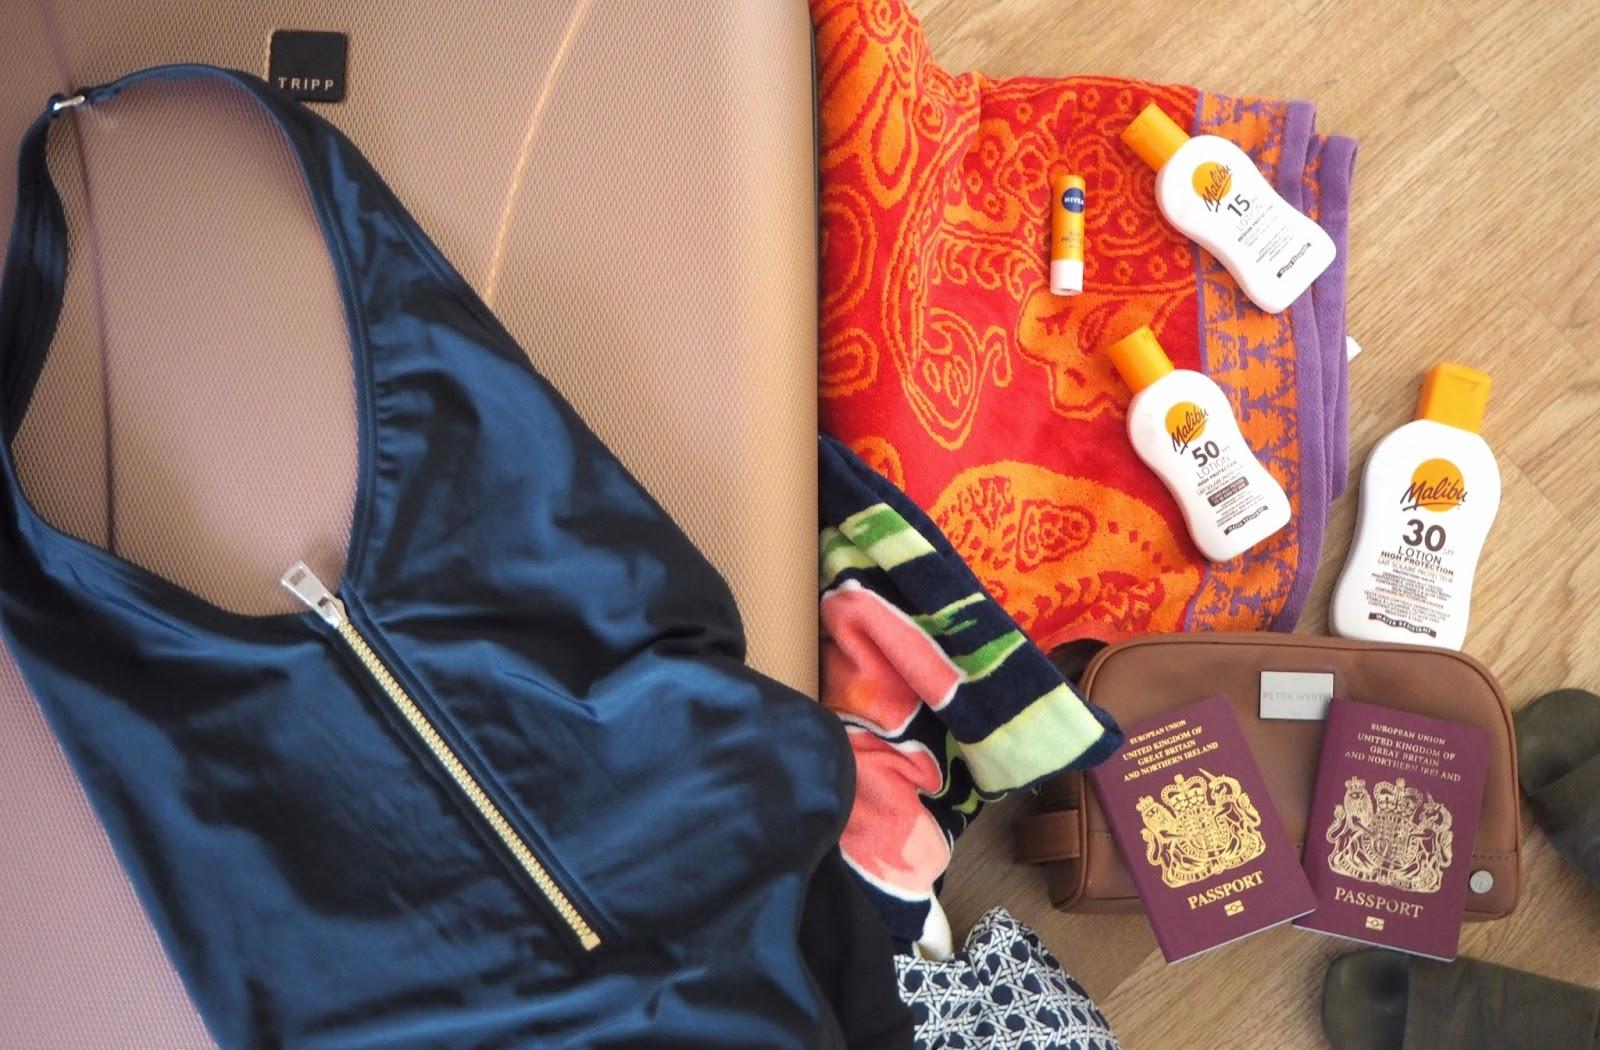 Suitcase Holiday